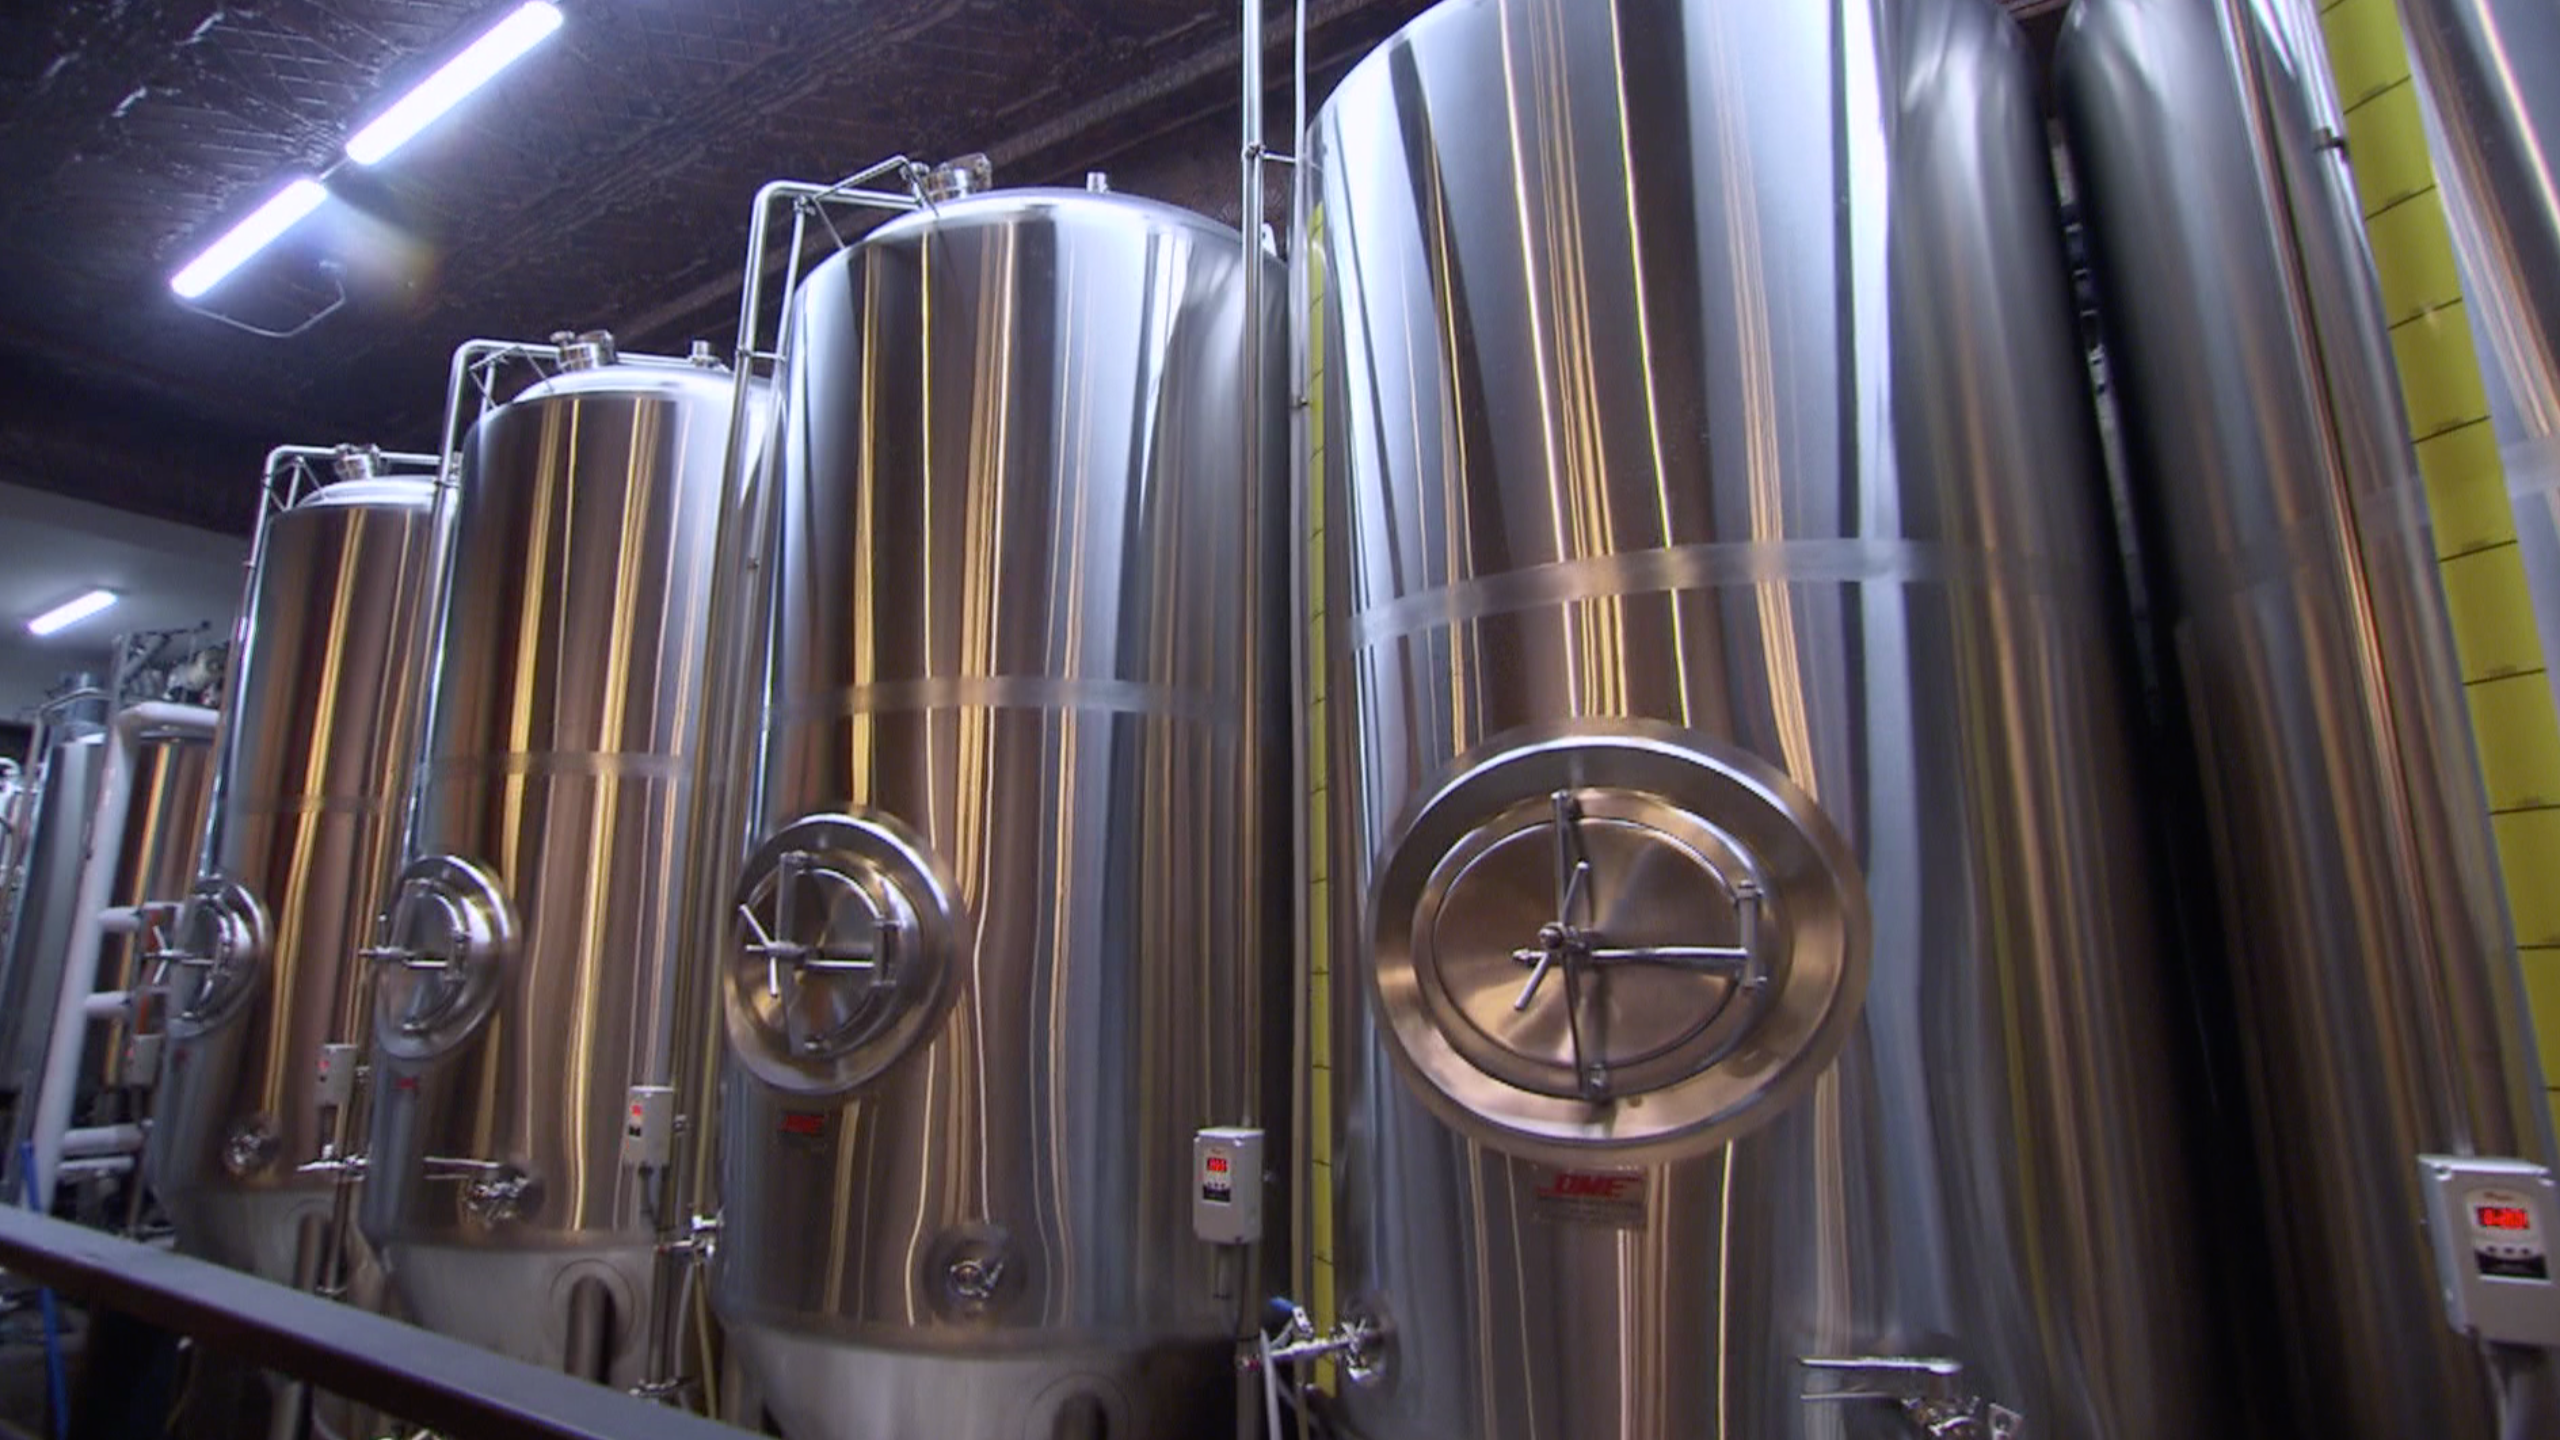 MNLARS mess, Enbridge Line 3 update, breweries tour